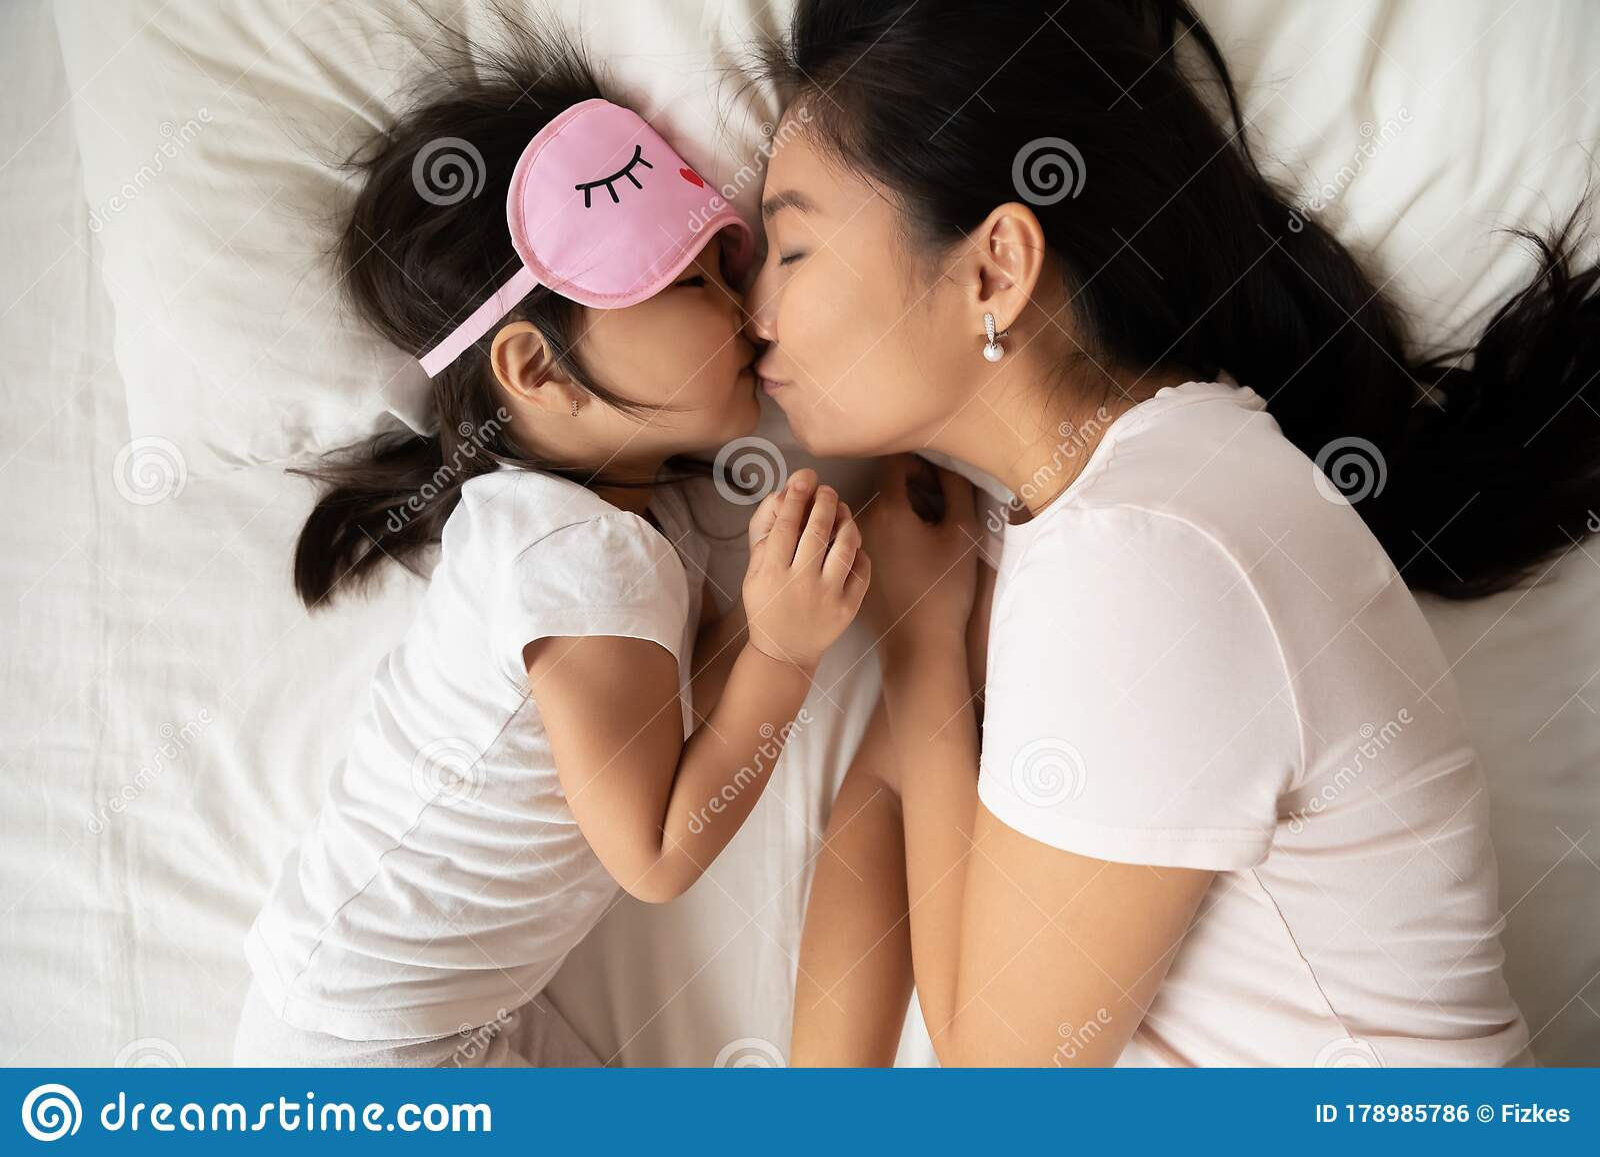 Asian Girls Face Pissing